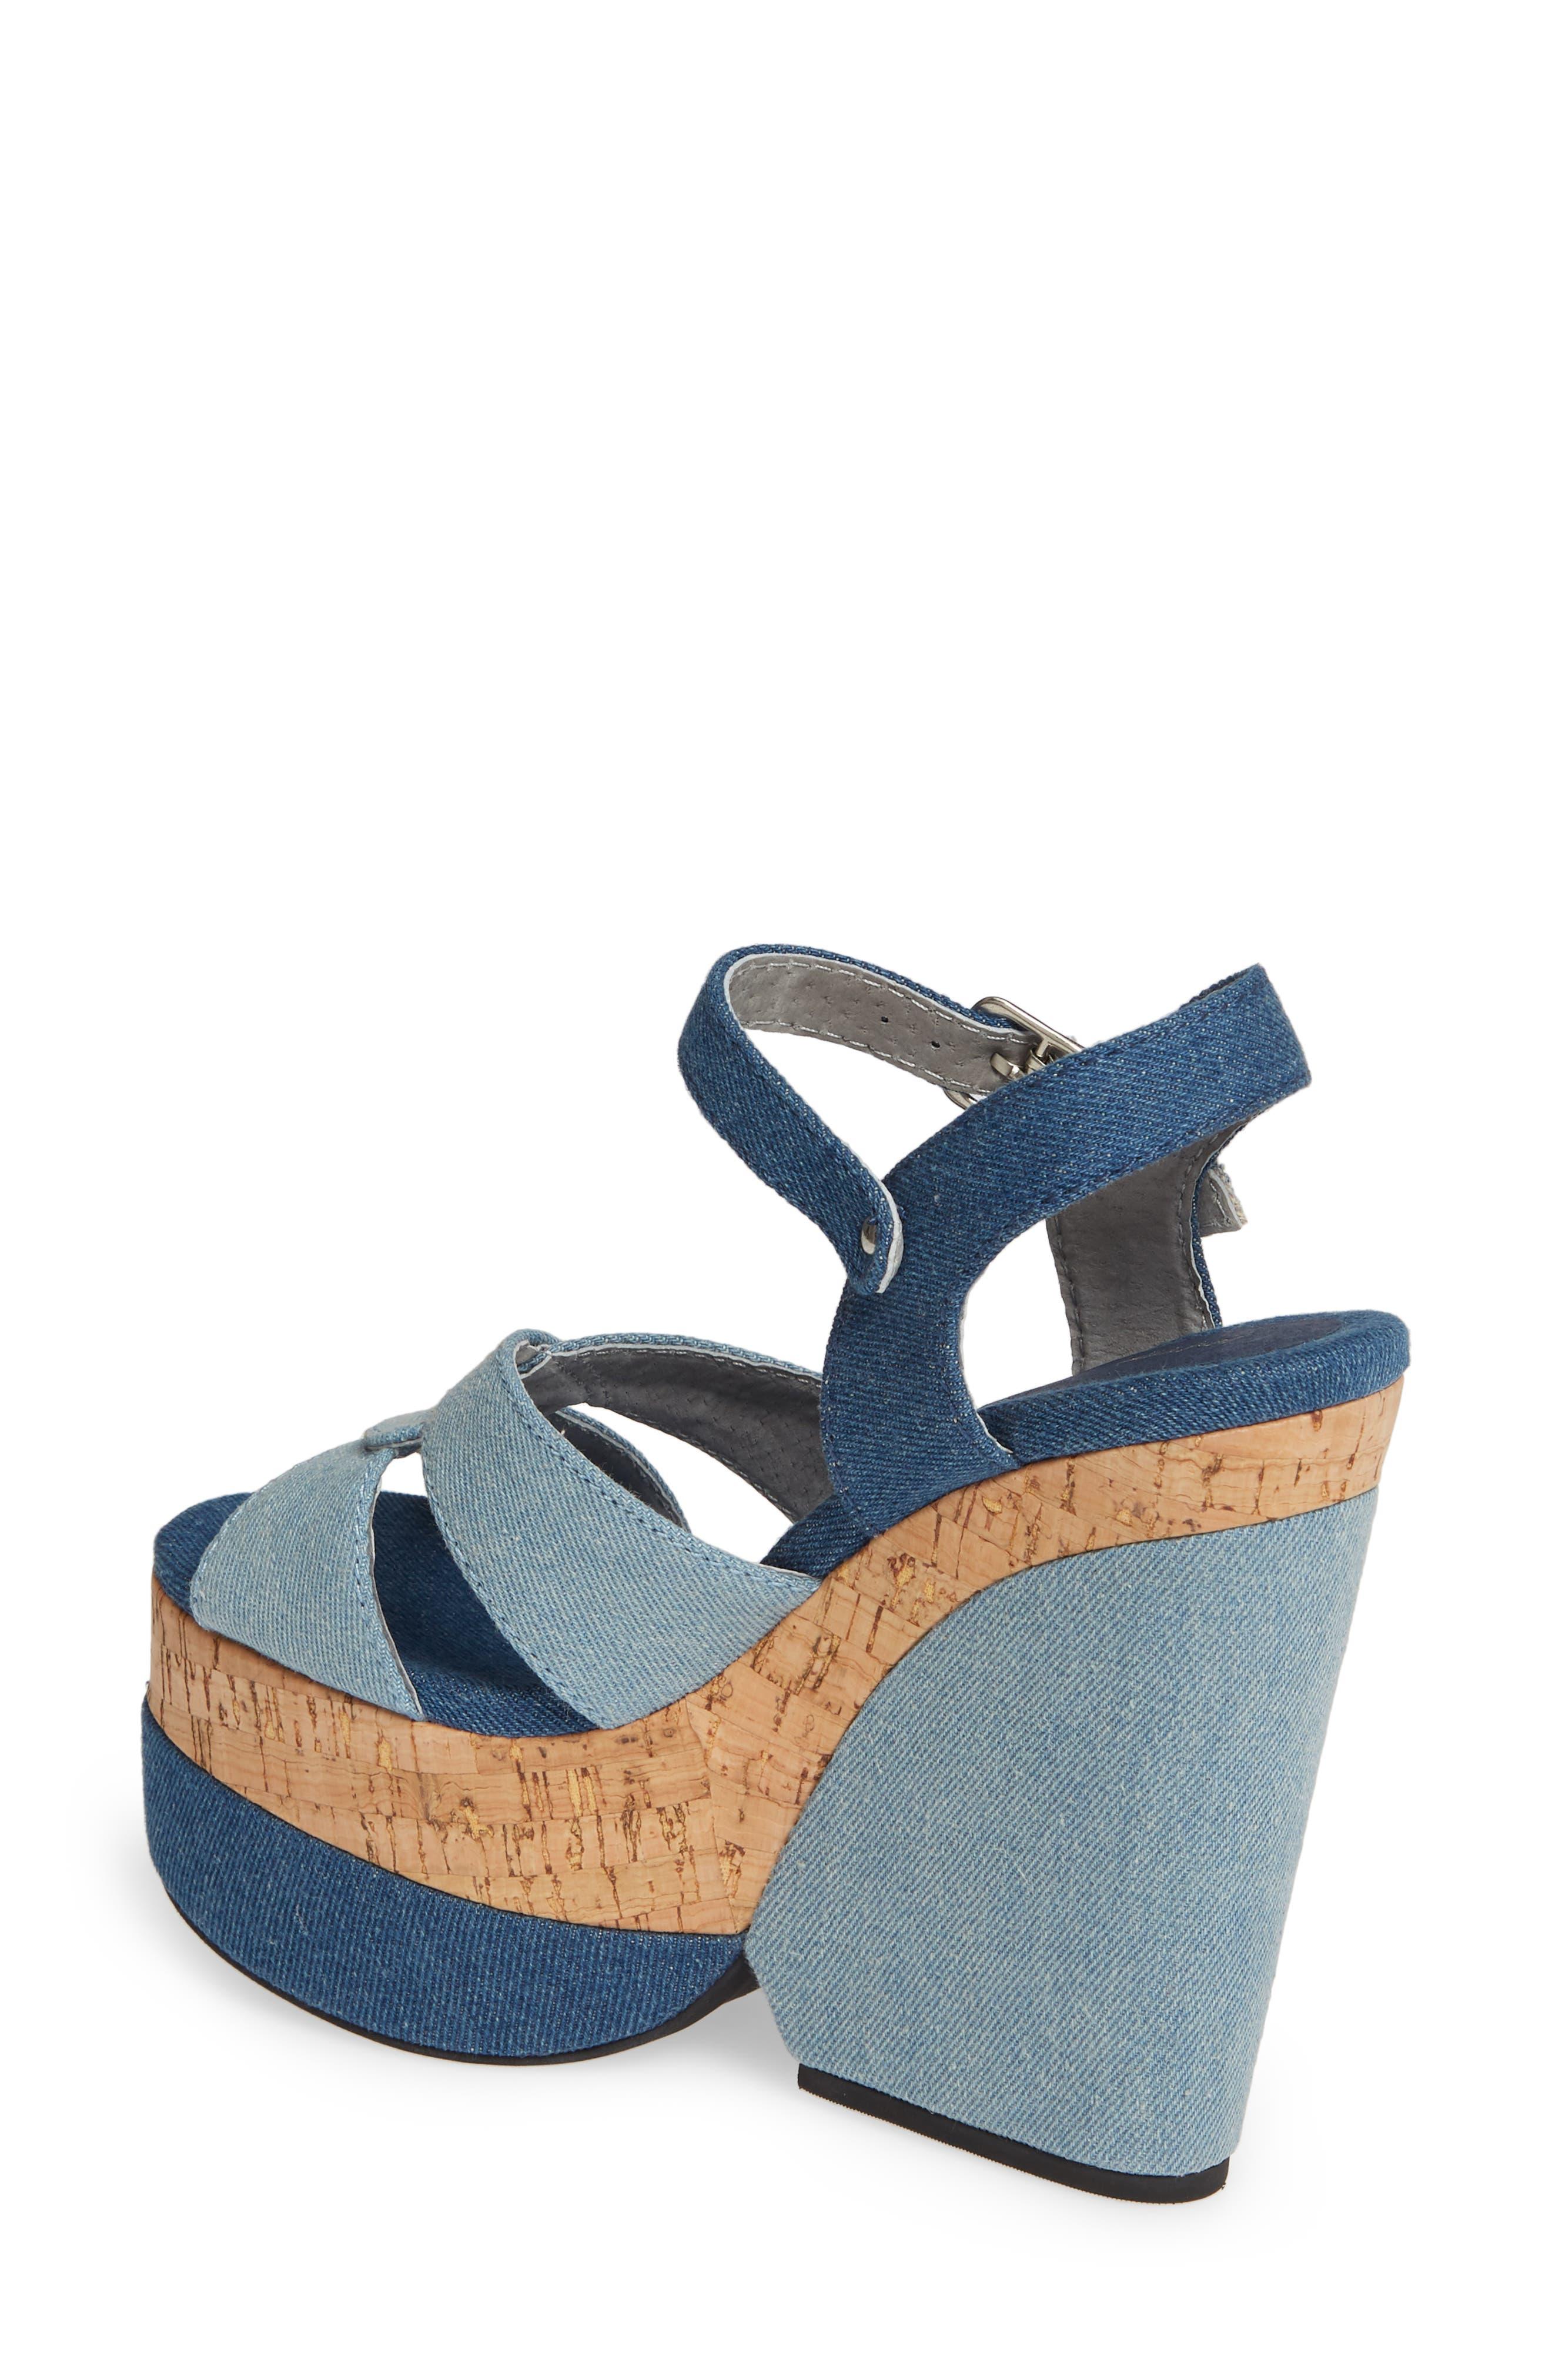 JEFFREY CAMPBELL, Wedge Platform Sandal, Alternate thumbnail 2, color, BLUE DENIM COMBO/ CORK